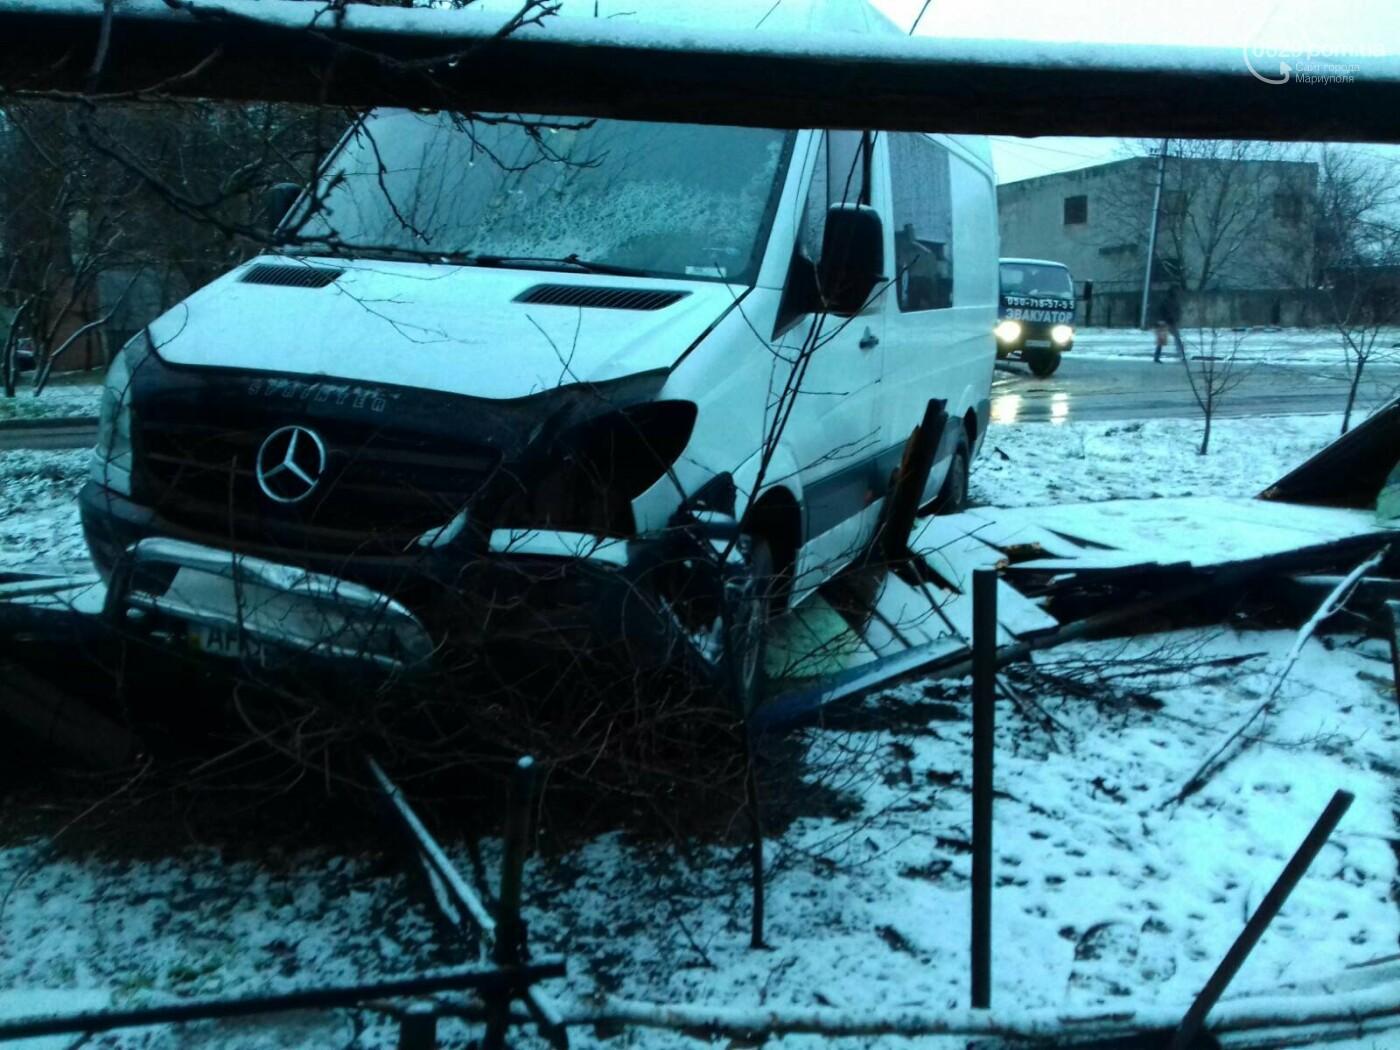 На Левобережье Мариуполя микроавтобус врезался в забор жилого дома, - ФОТО, фото-3